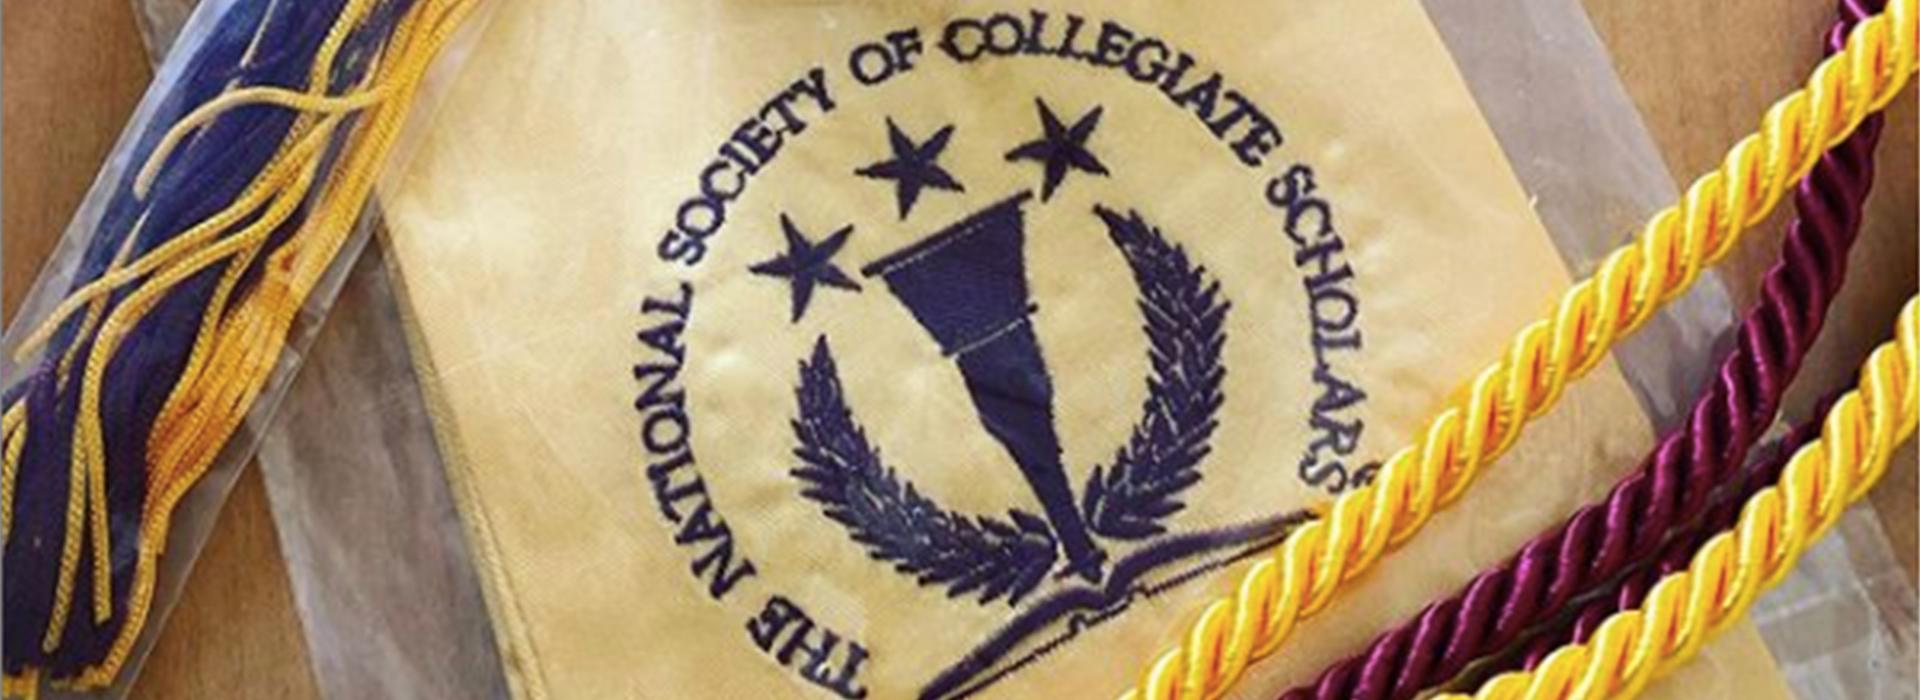 National Society of Collegiate Scholars recognizes CSUSB chapter